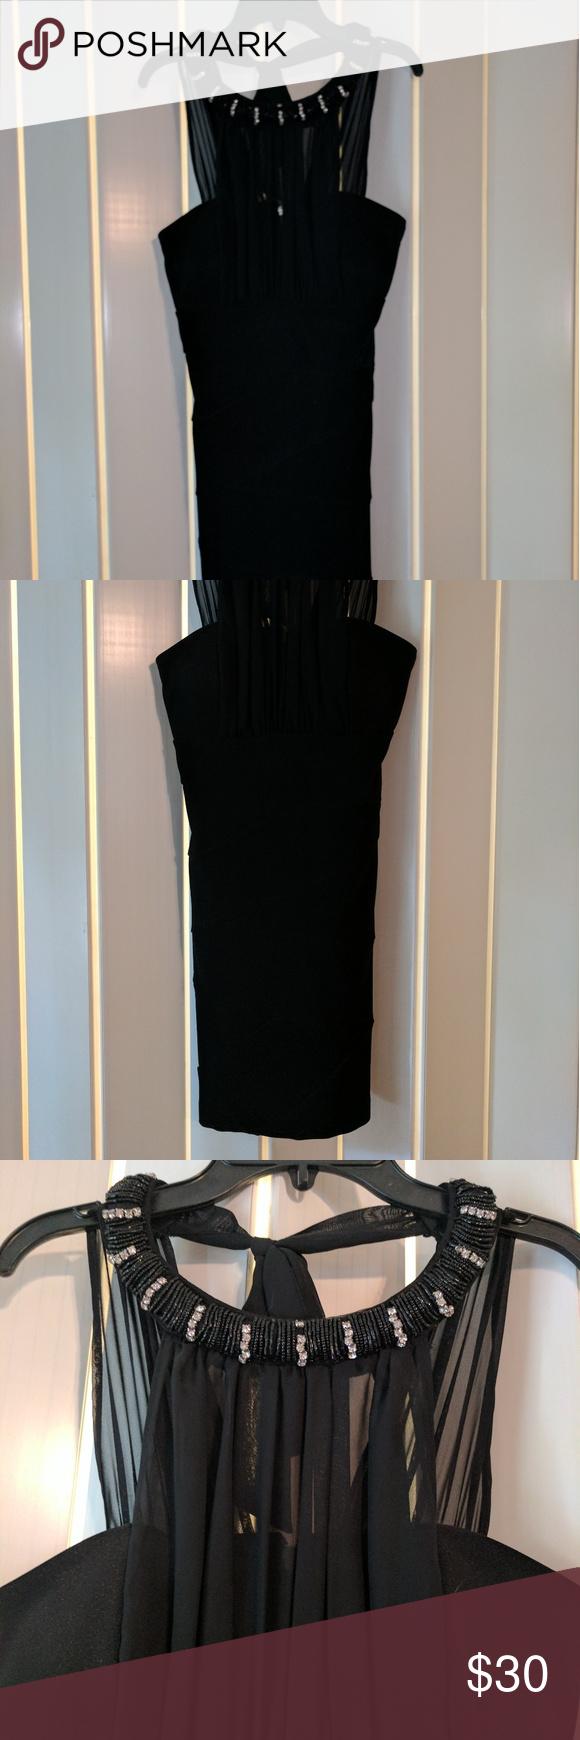 Emerald sundae halter dress emerald sundae size m form fitted halter